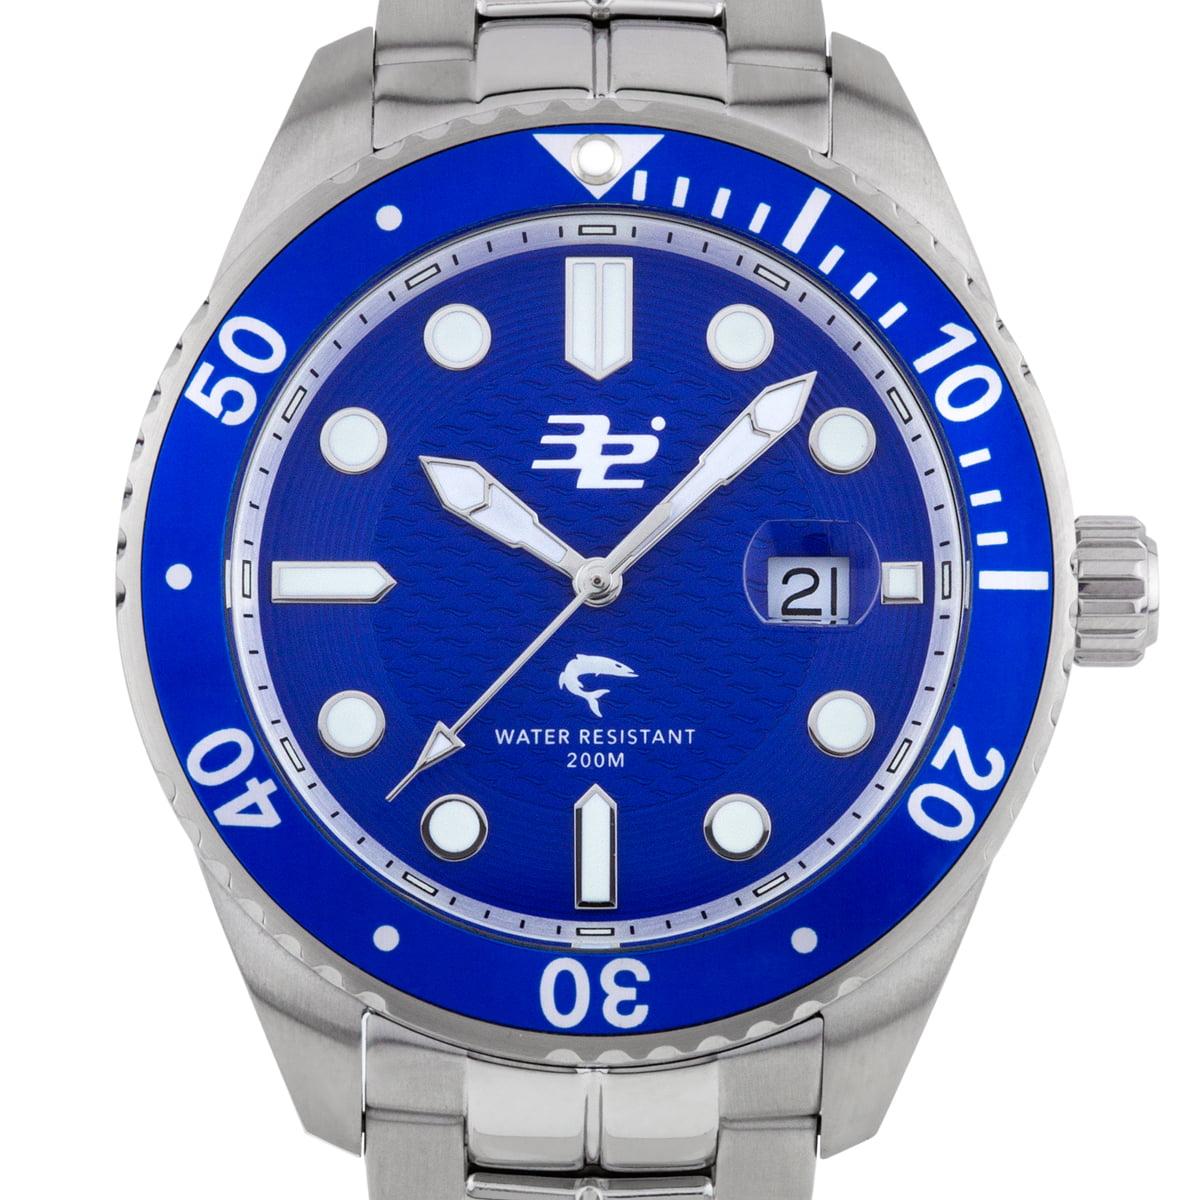 32 Degrees Blacktip Men's Swiss Made Diver Watch